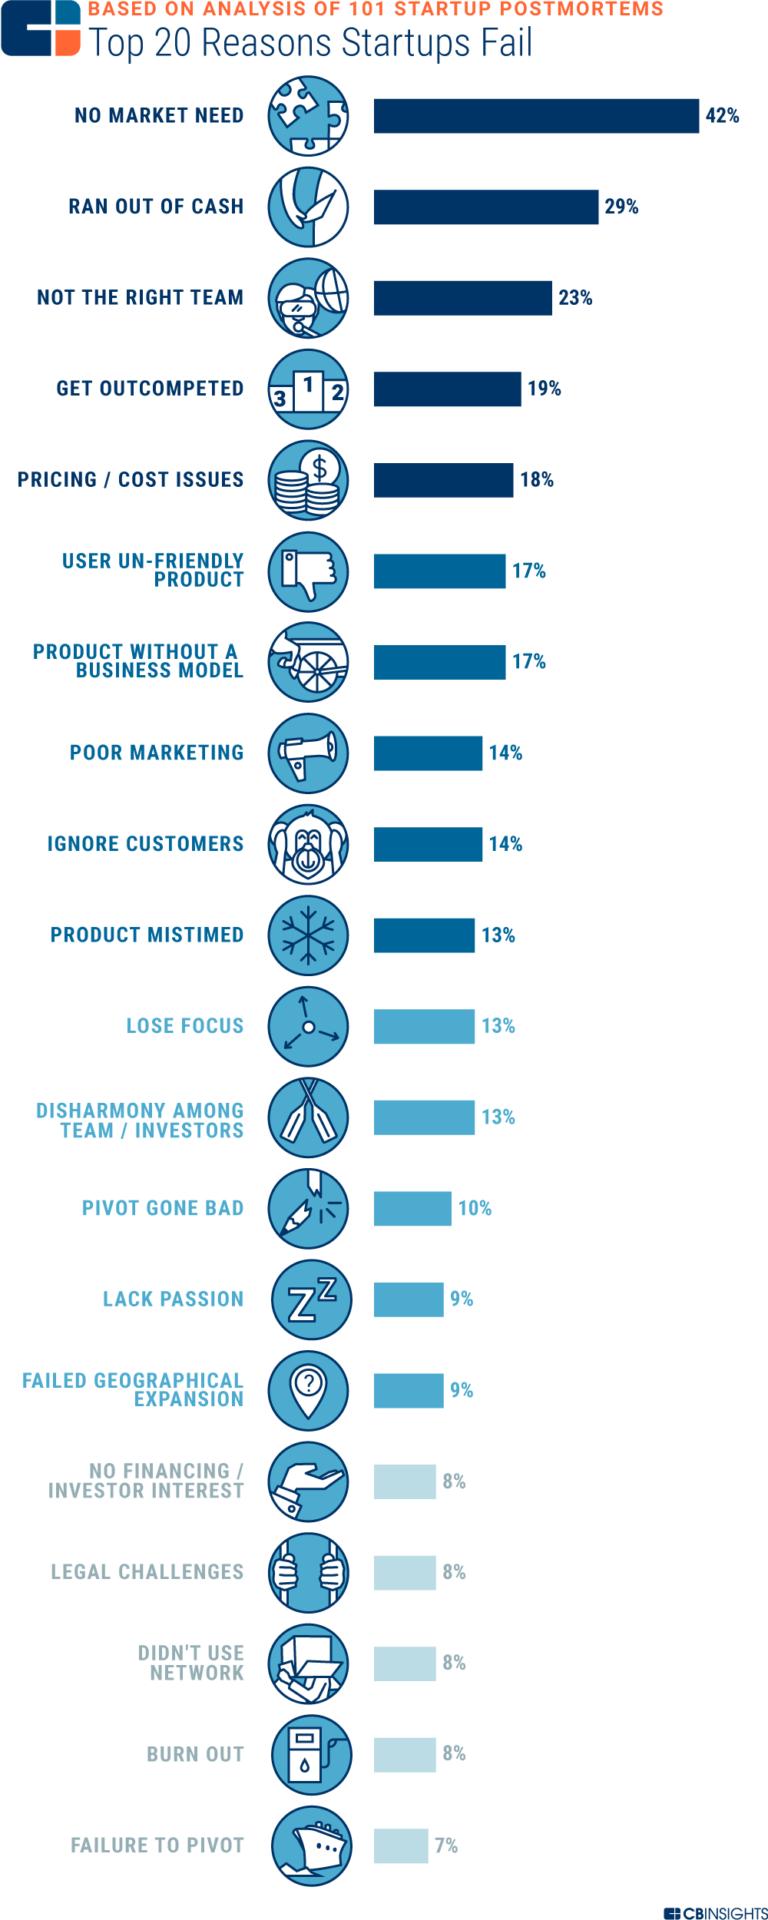 20 redenen waarom startups falen - CBS insights